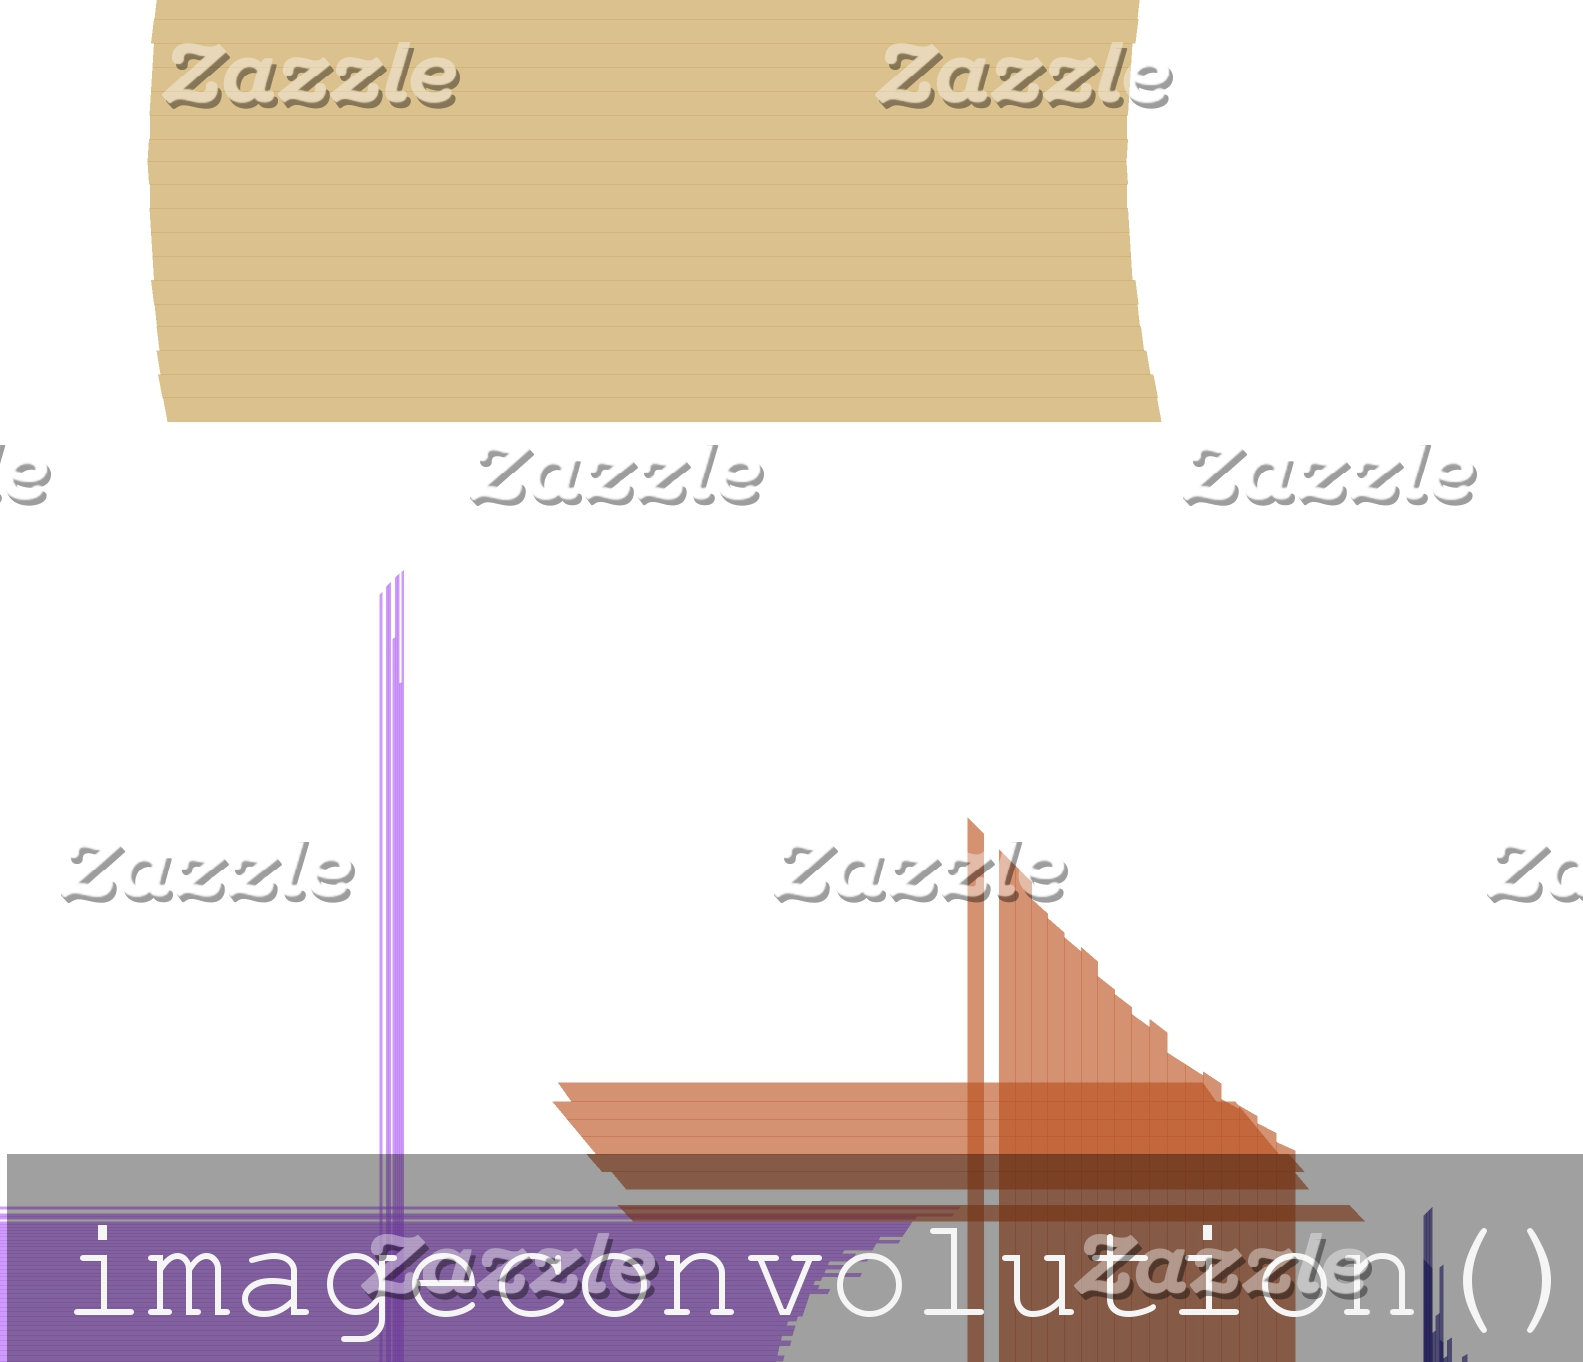 imageconvolution() Designs